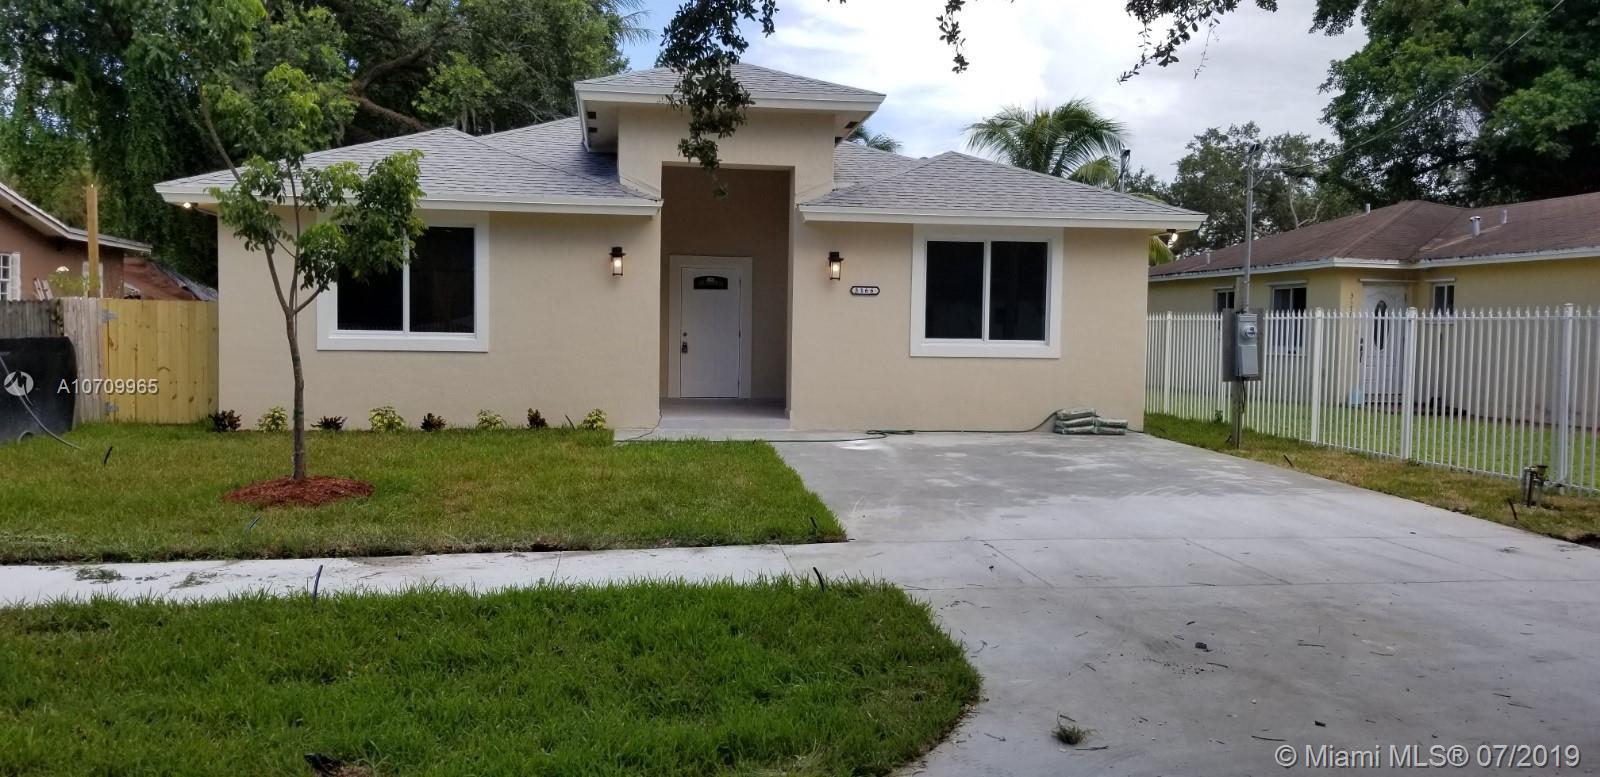 3166 Nw 170th St Miami Gardens, FL 33056